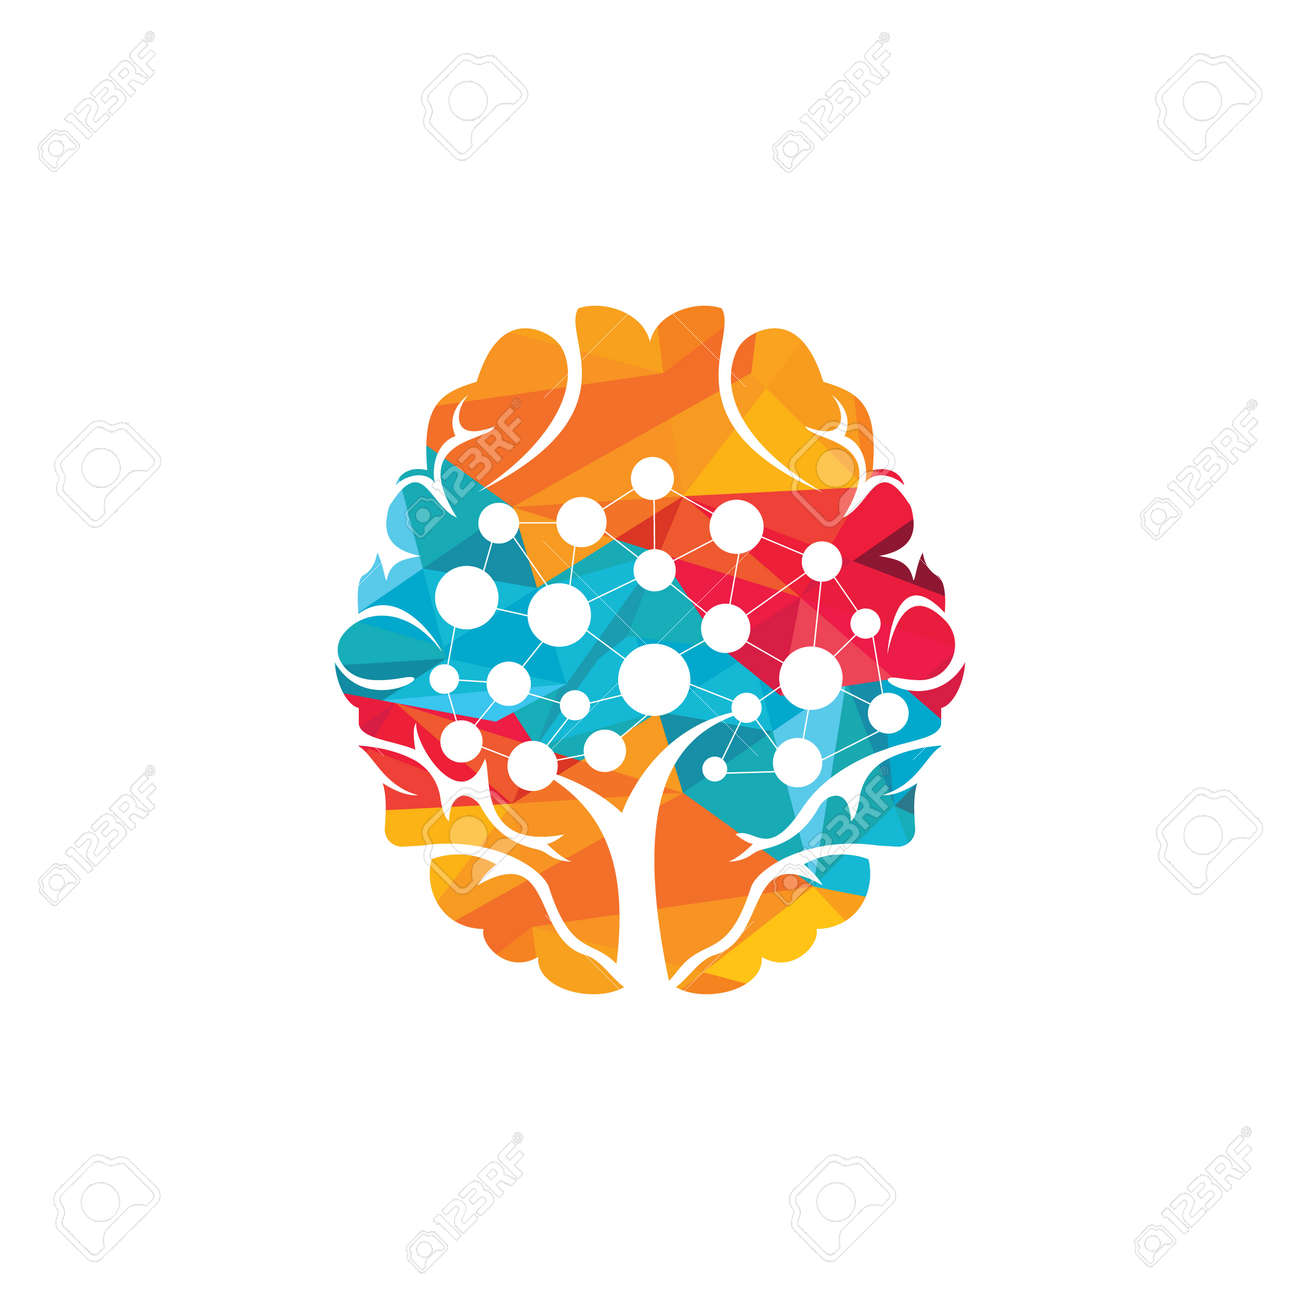 Brain technology vector logo design. Robotic Brain logo template. - 157918574